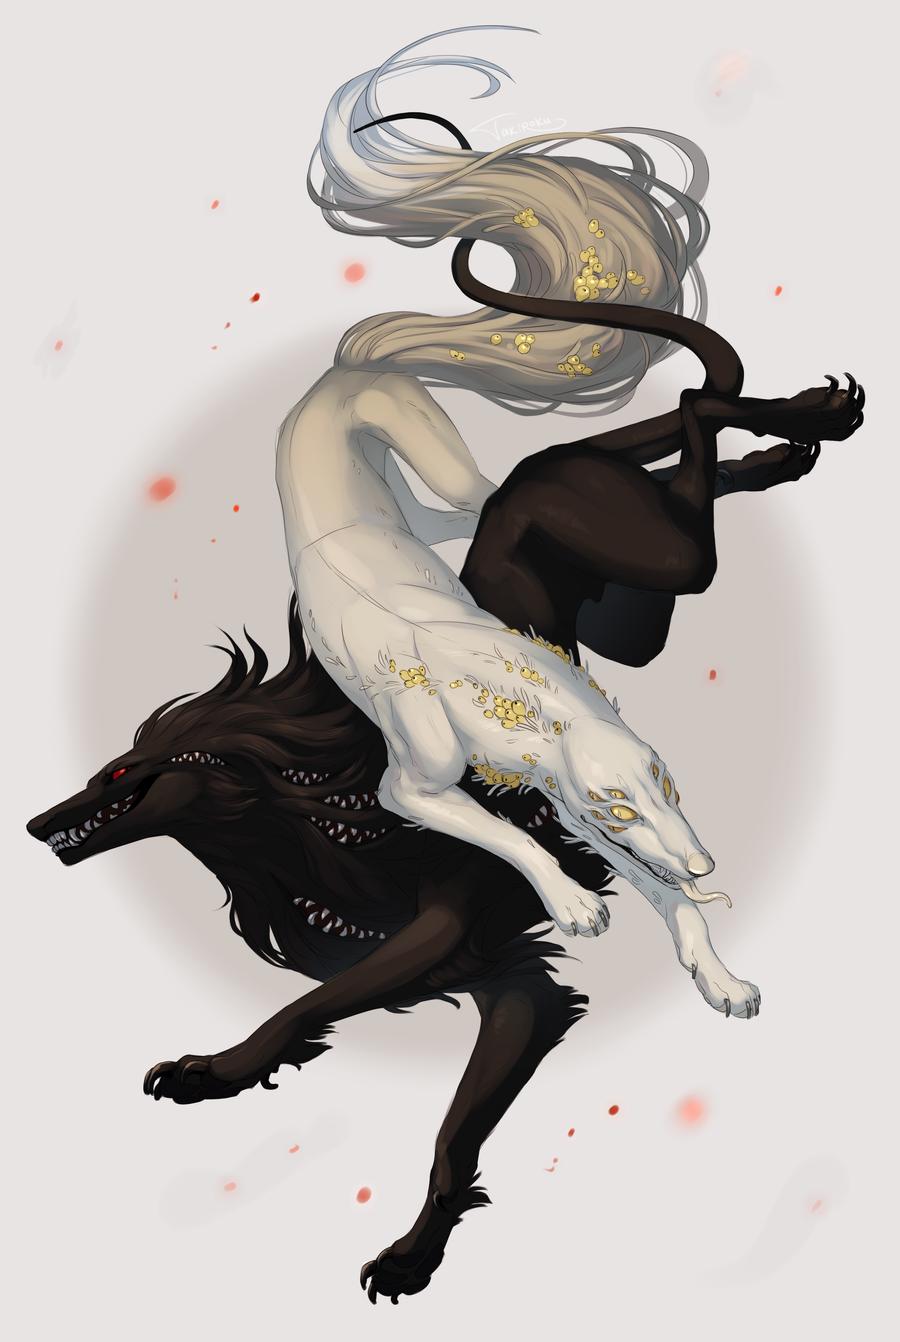 Mofrus and Dalar by Takiroku